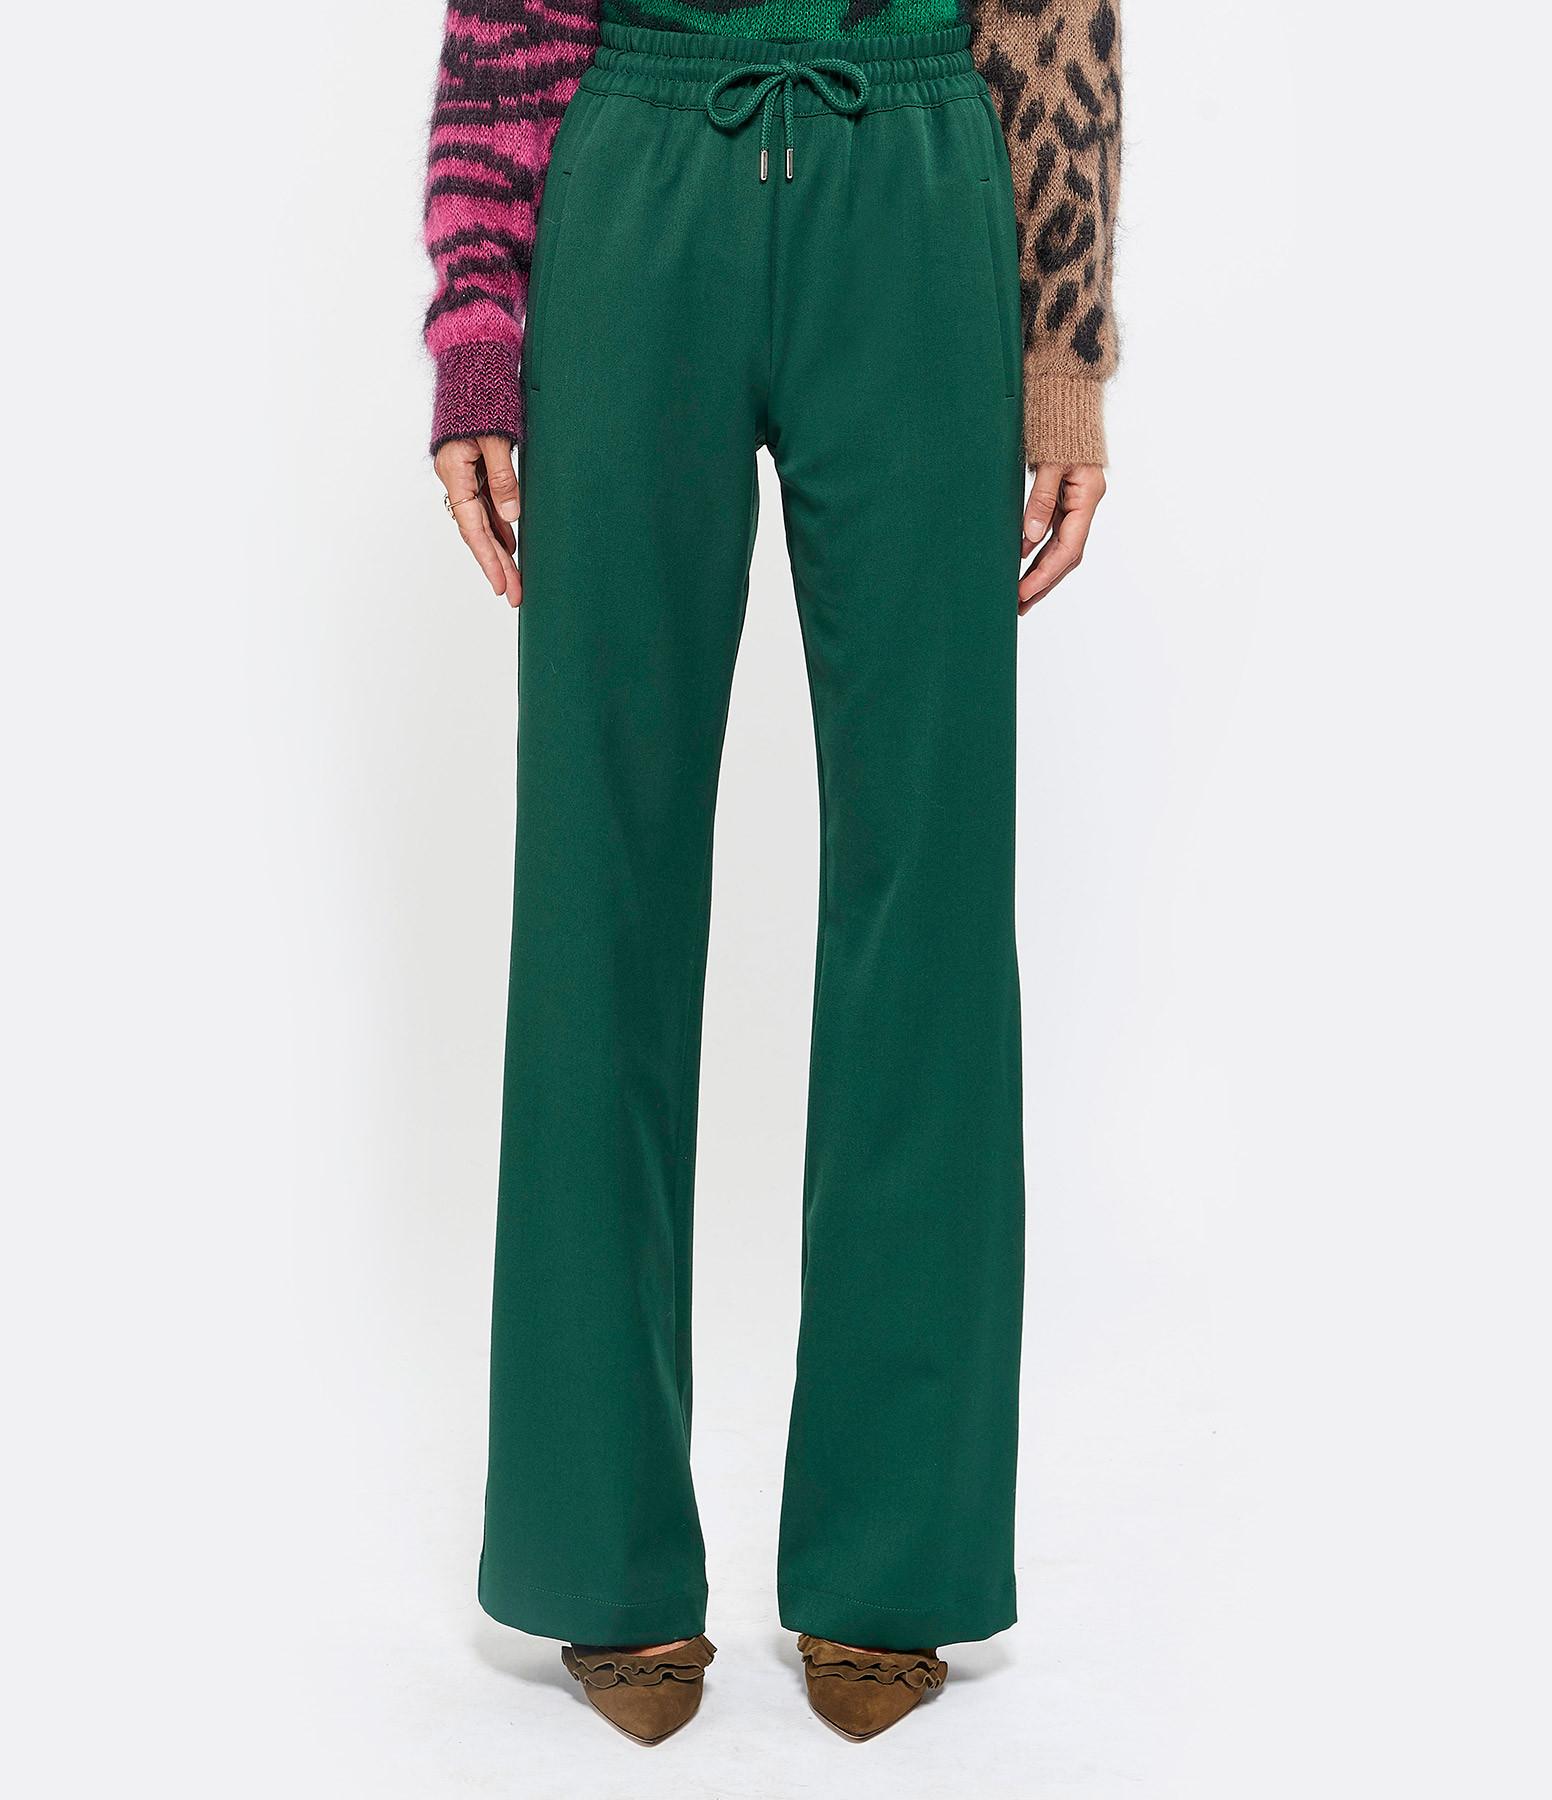 ESSENTIEL ANTWERP - Pantalon Thunderdome Vert